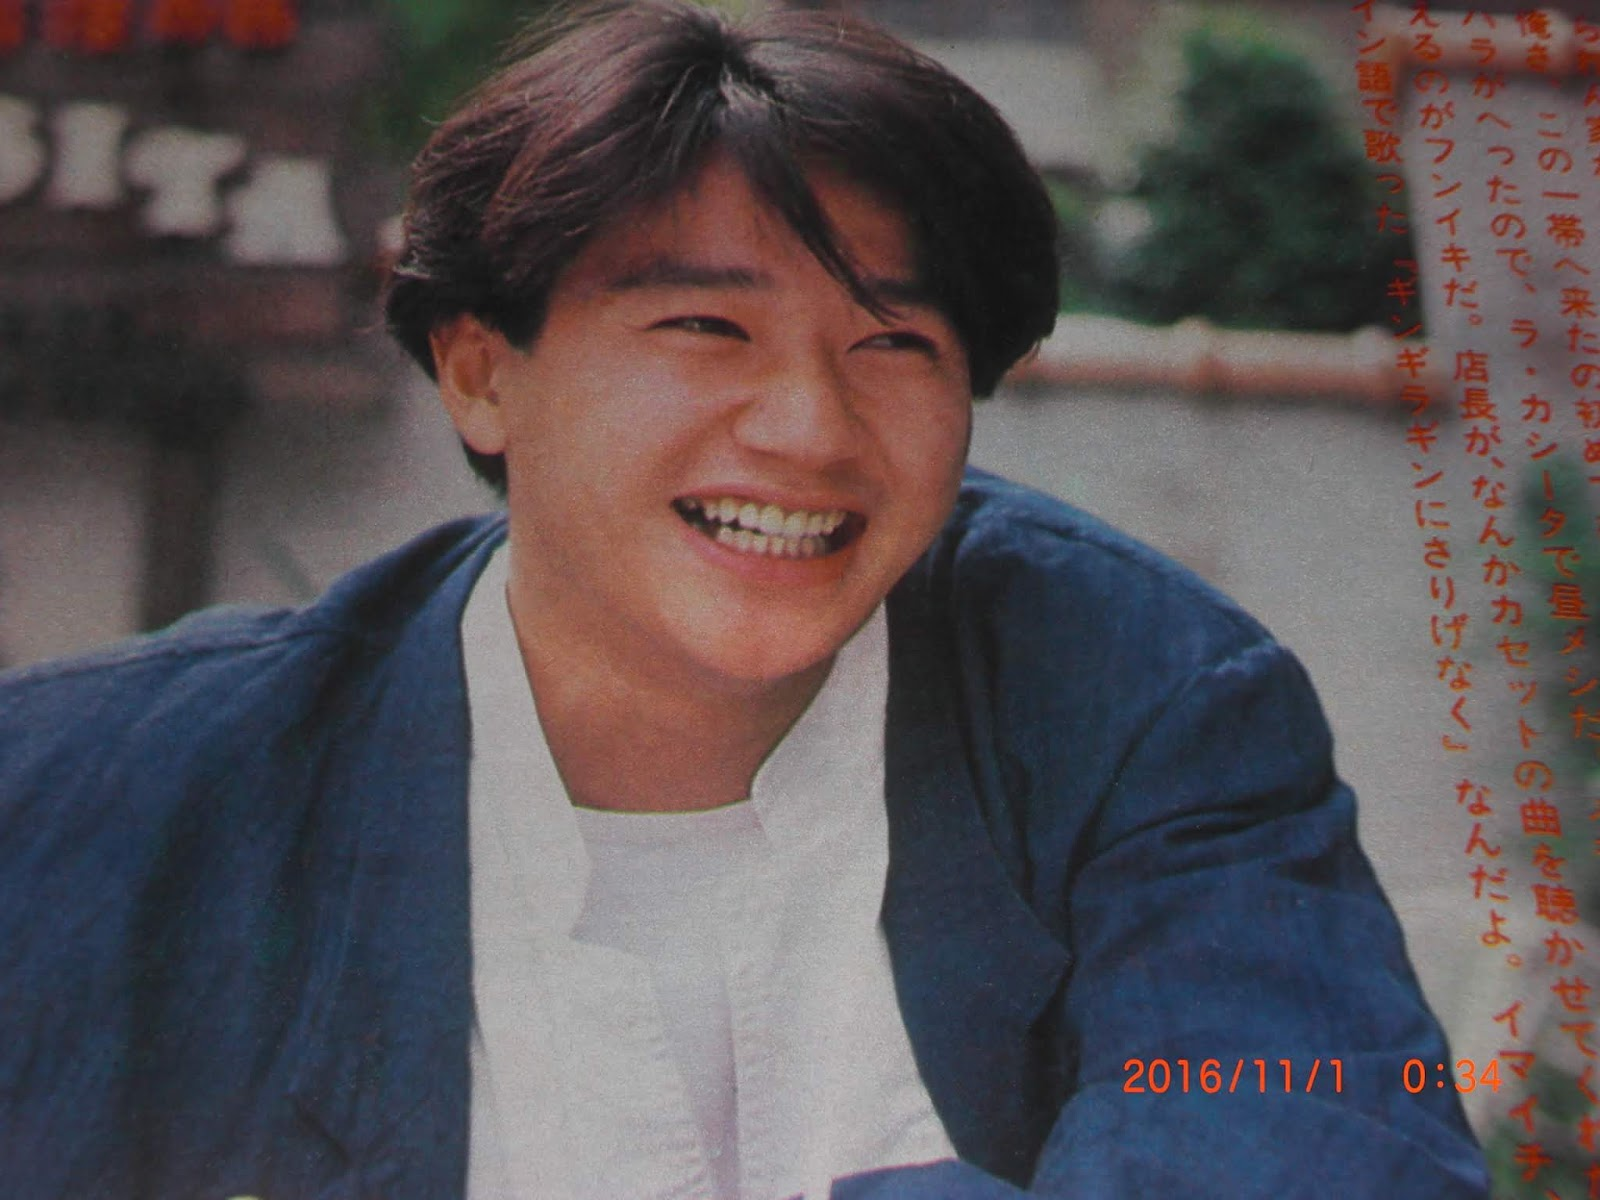 Kayo Kyoku Plus: Masahiko Kondo/Tetsuro Oda -- Baby Rose